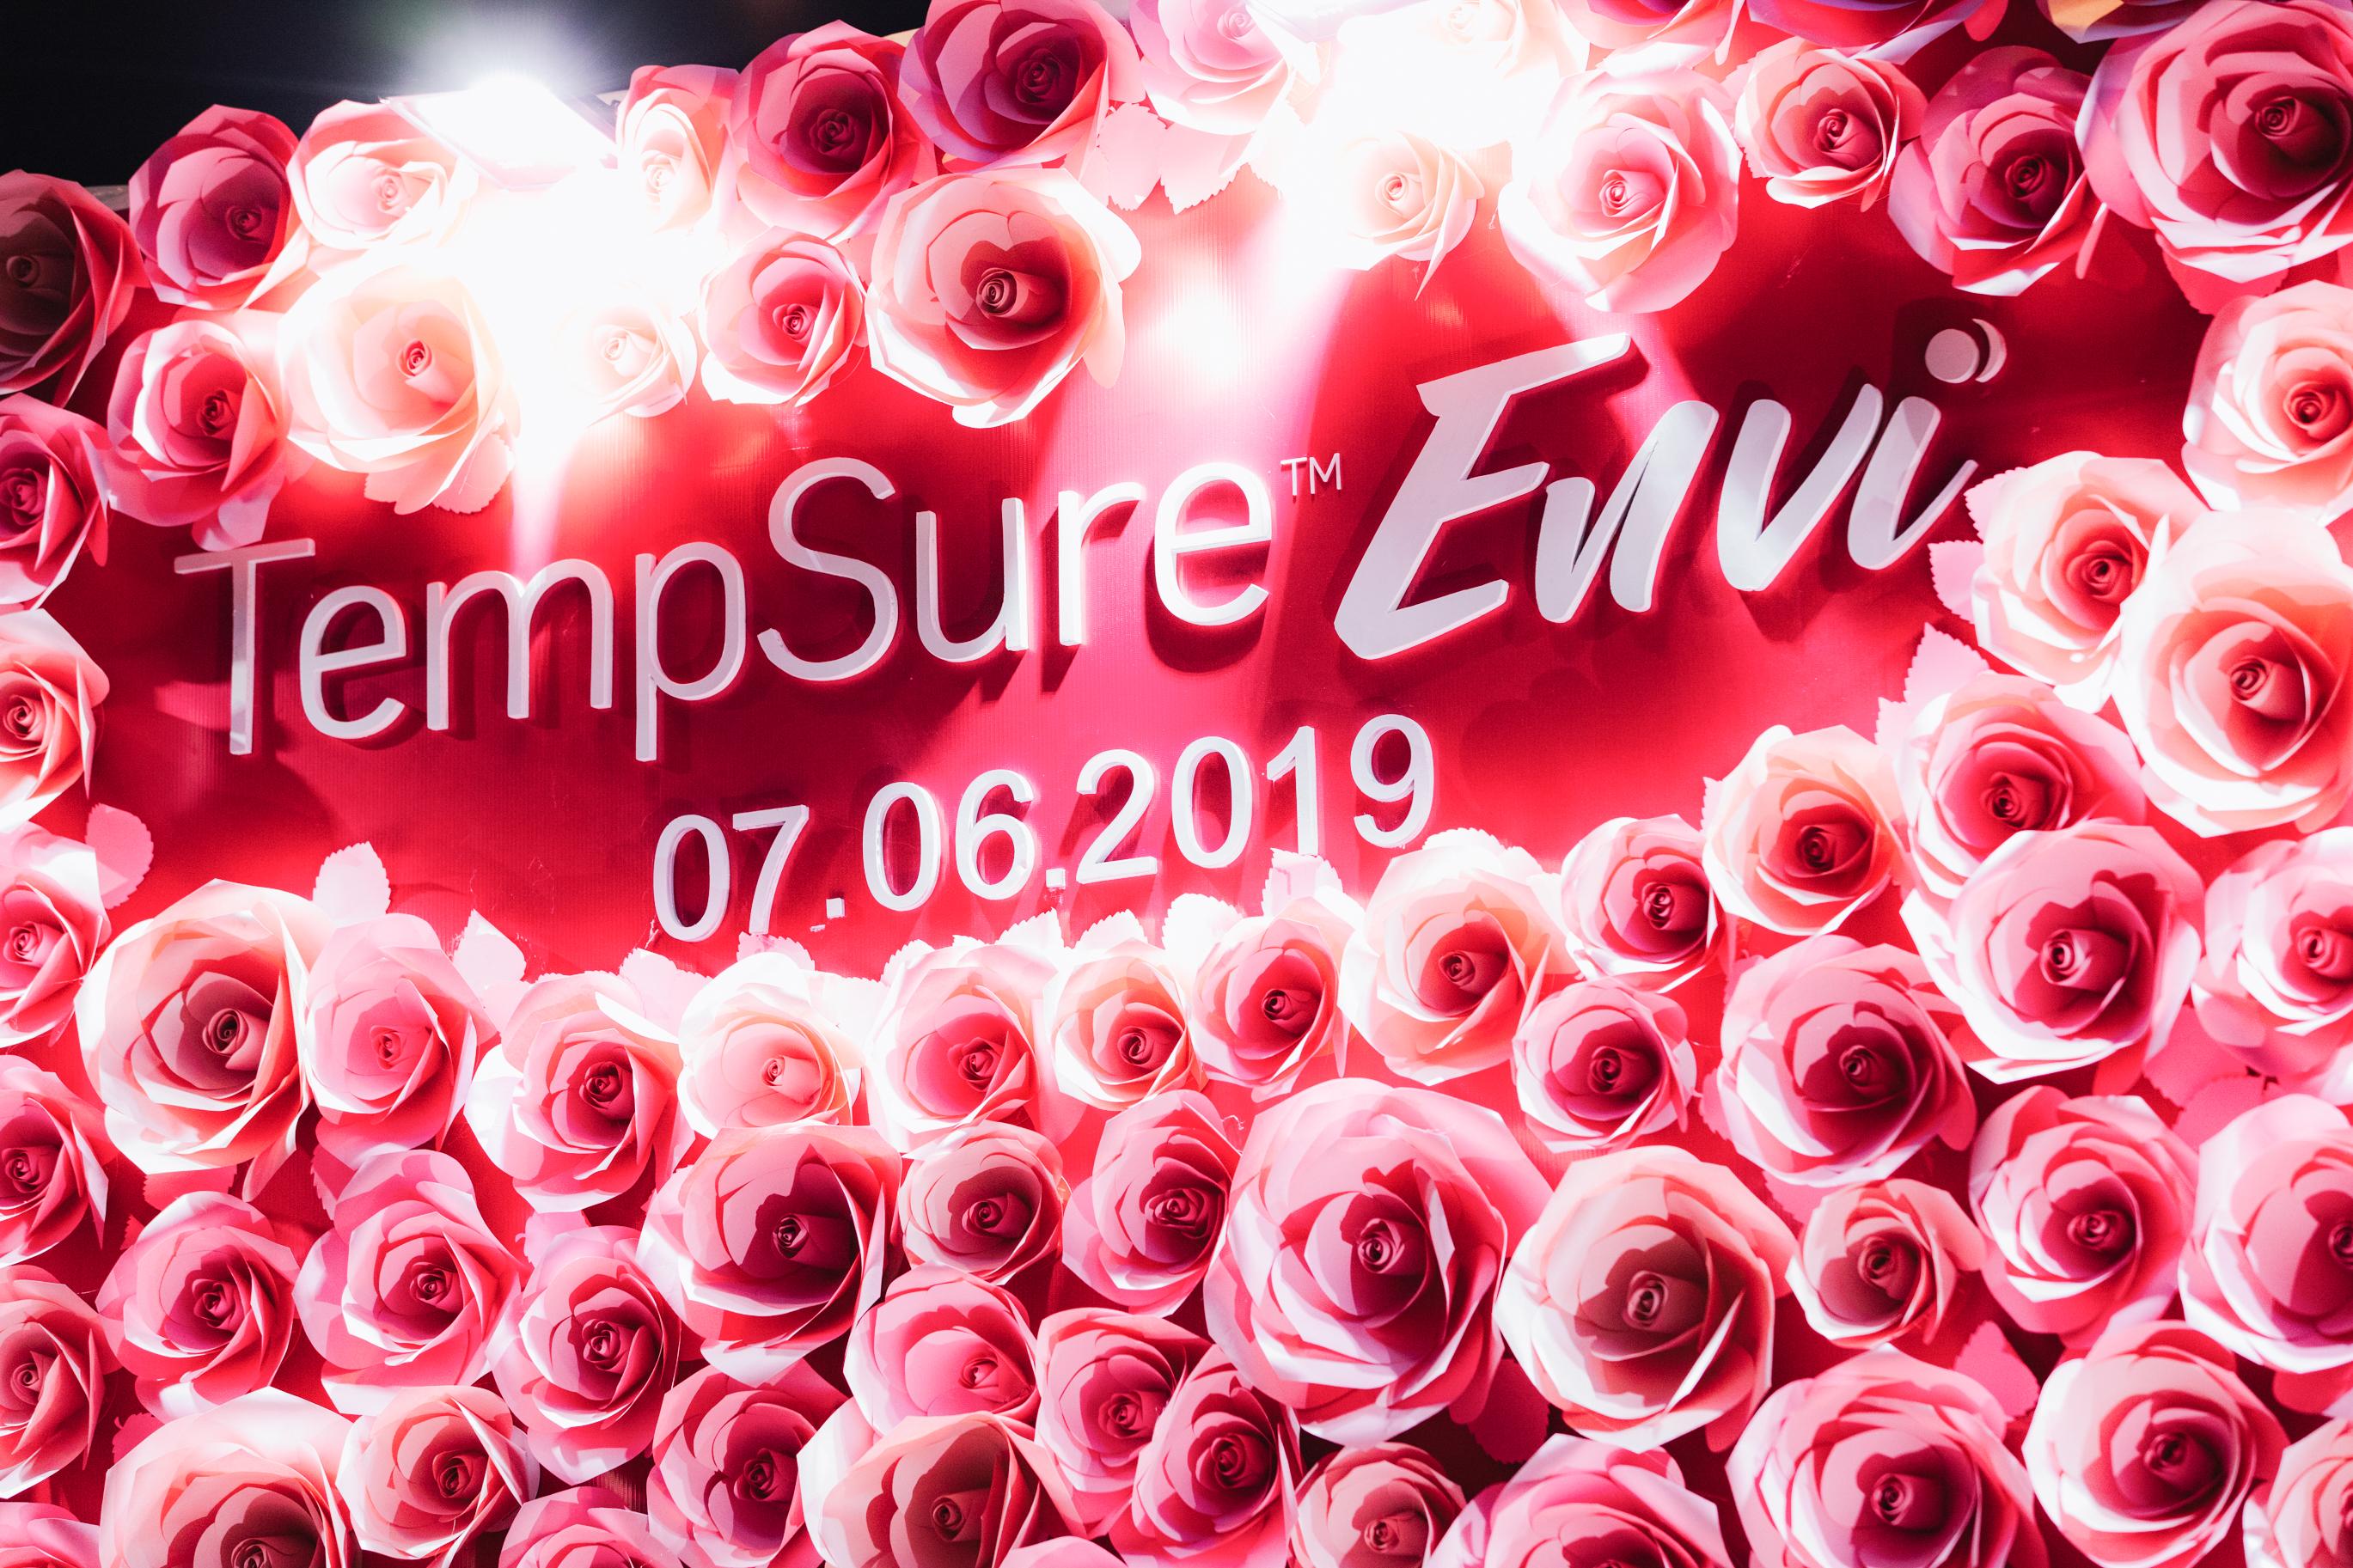 Ra mắt công nghệ TempSure Envi - 07.6.2019 Gem Center